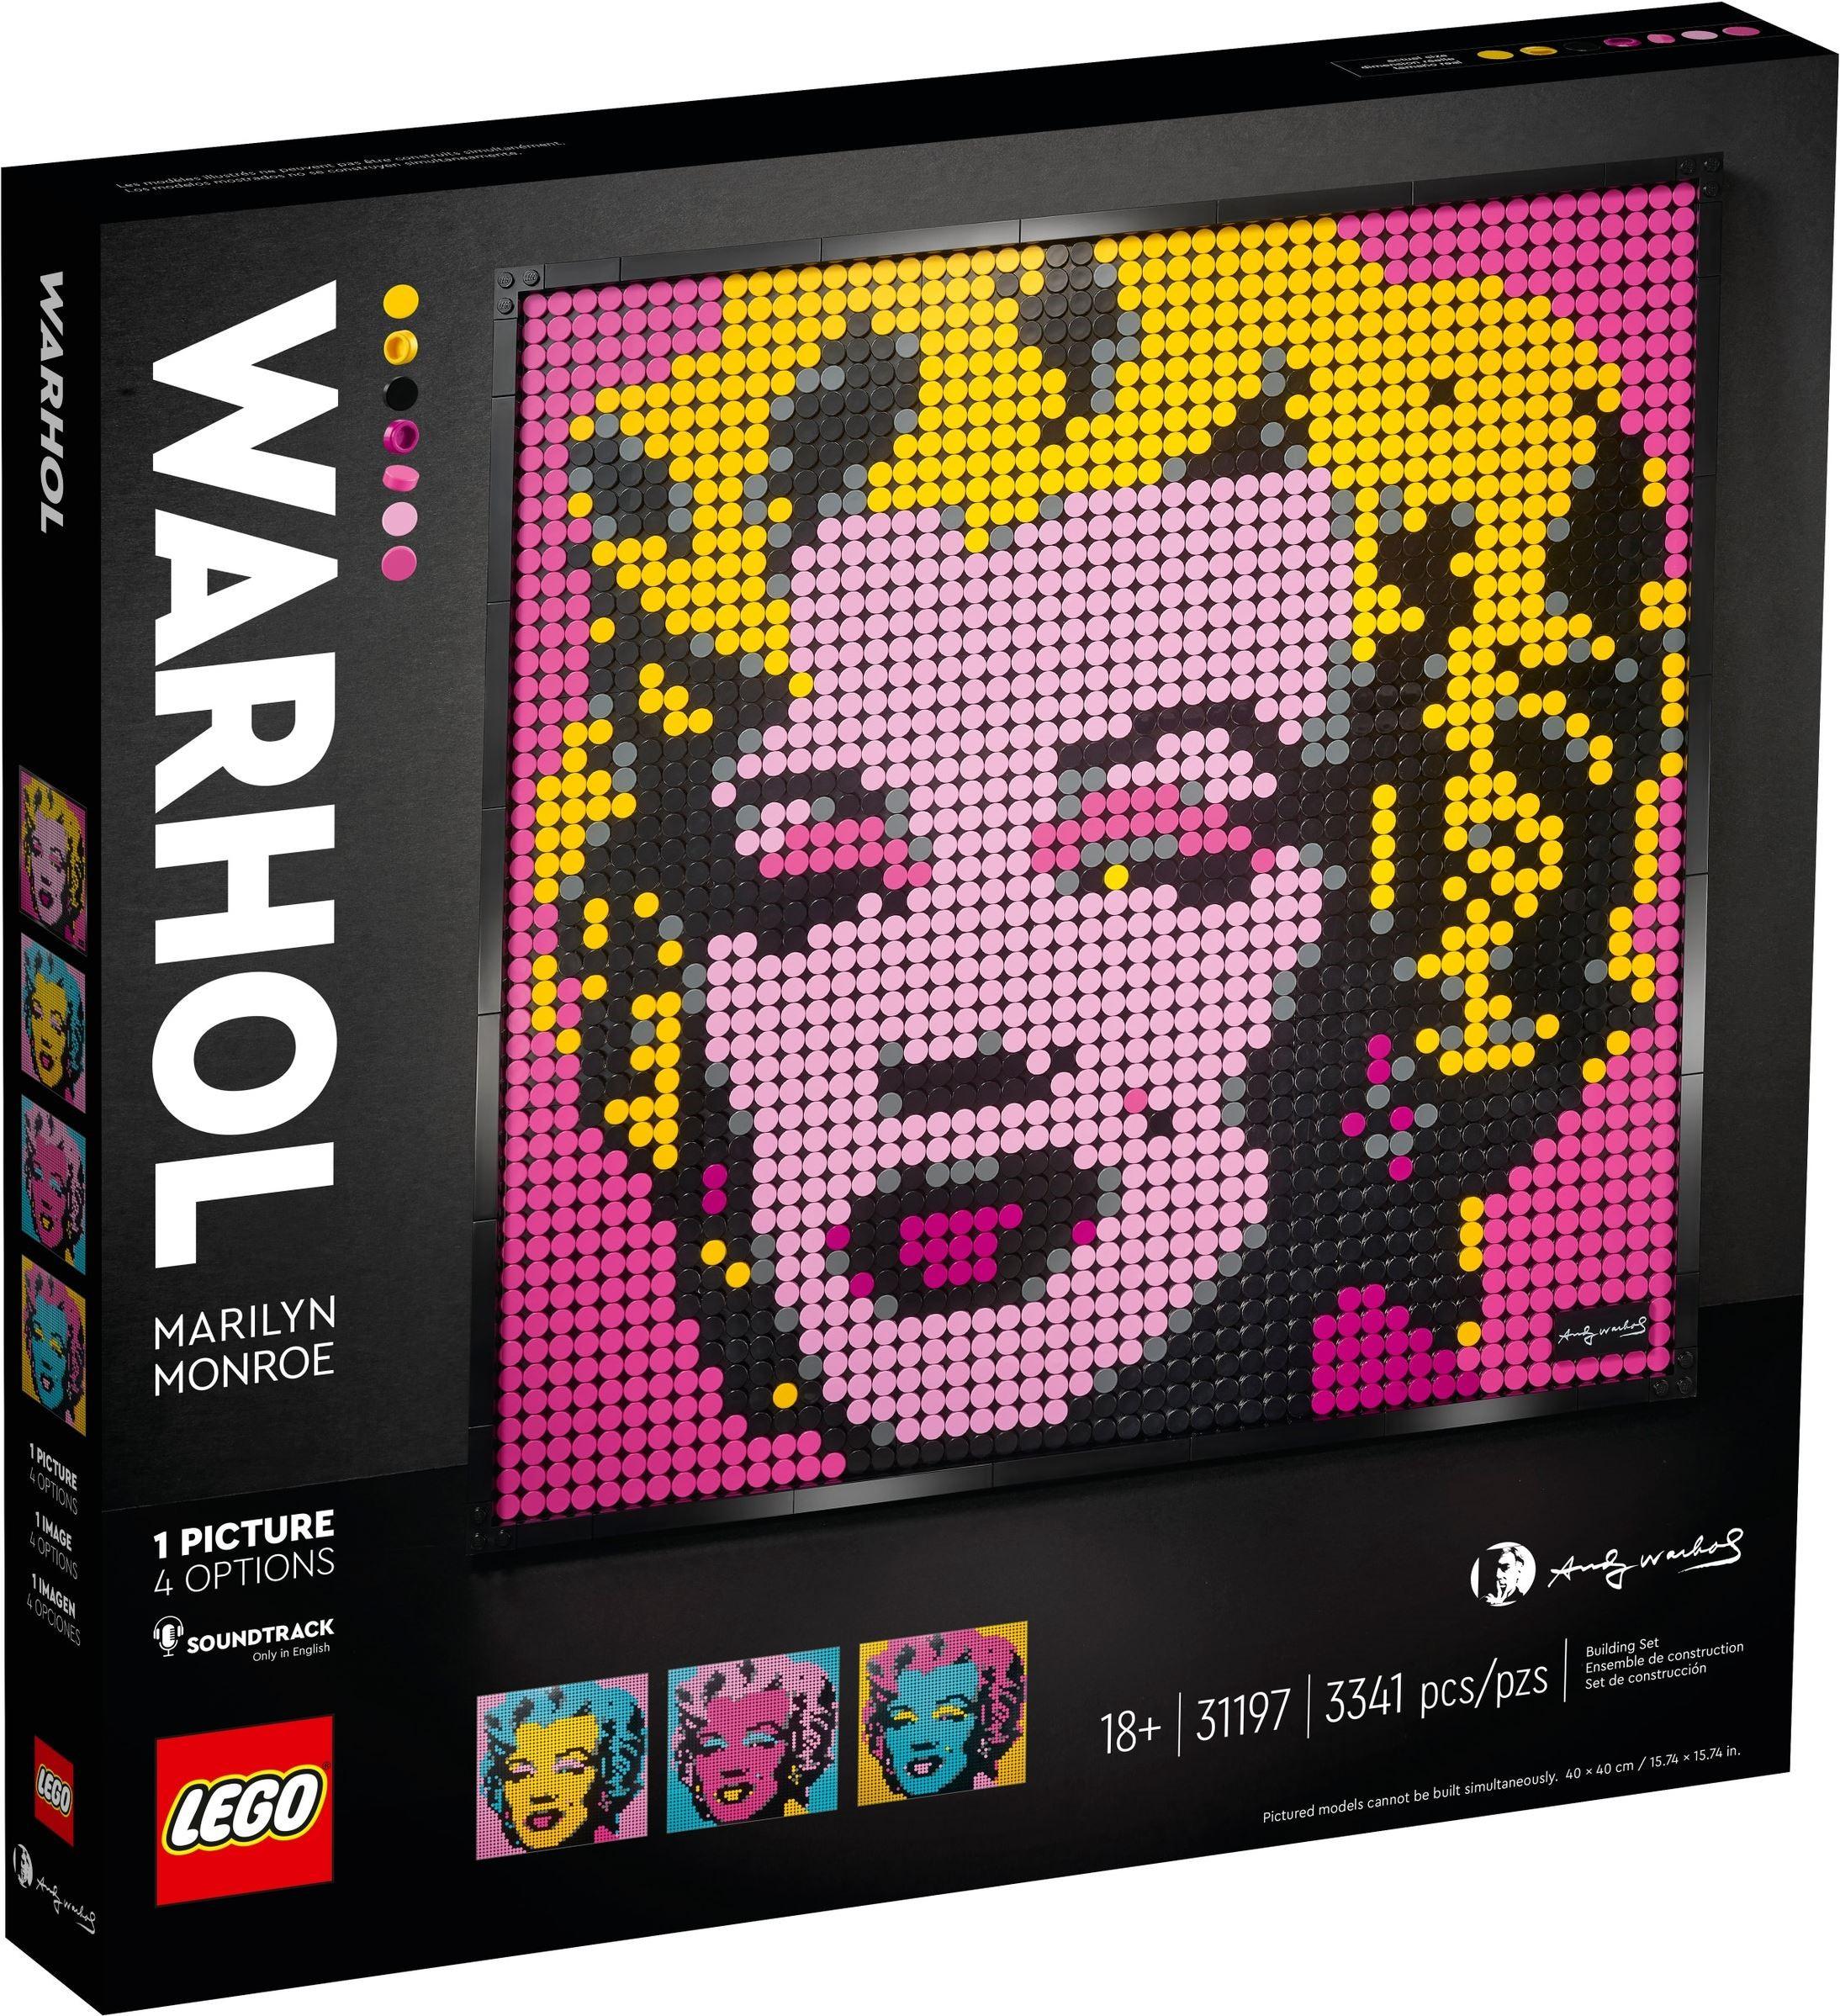 LEGO Art - Andy Warhol's Marilyn Monroe (31197)